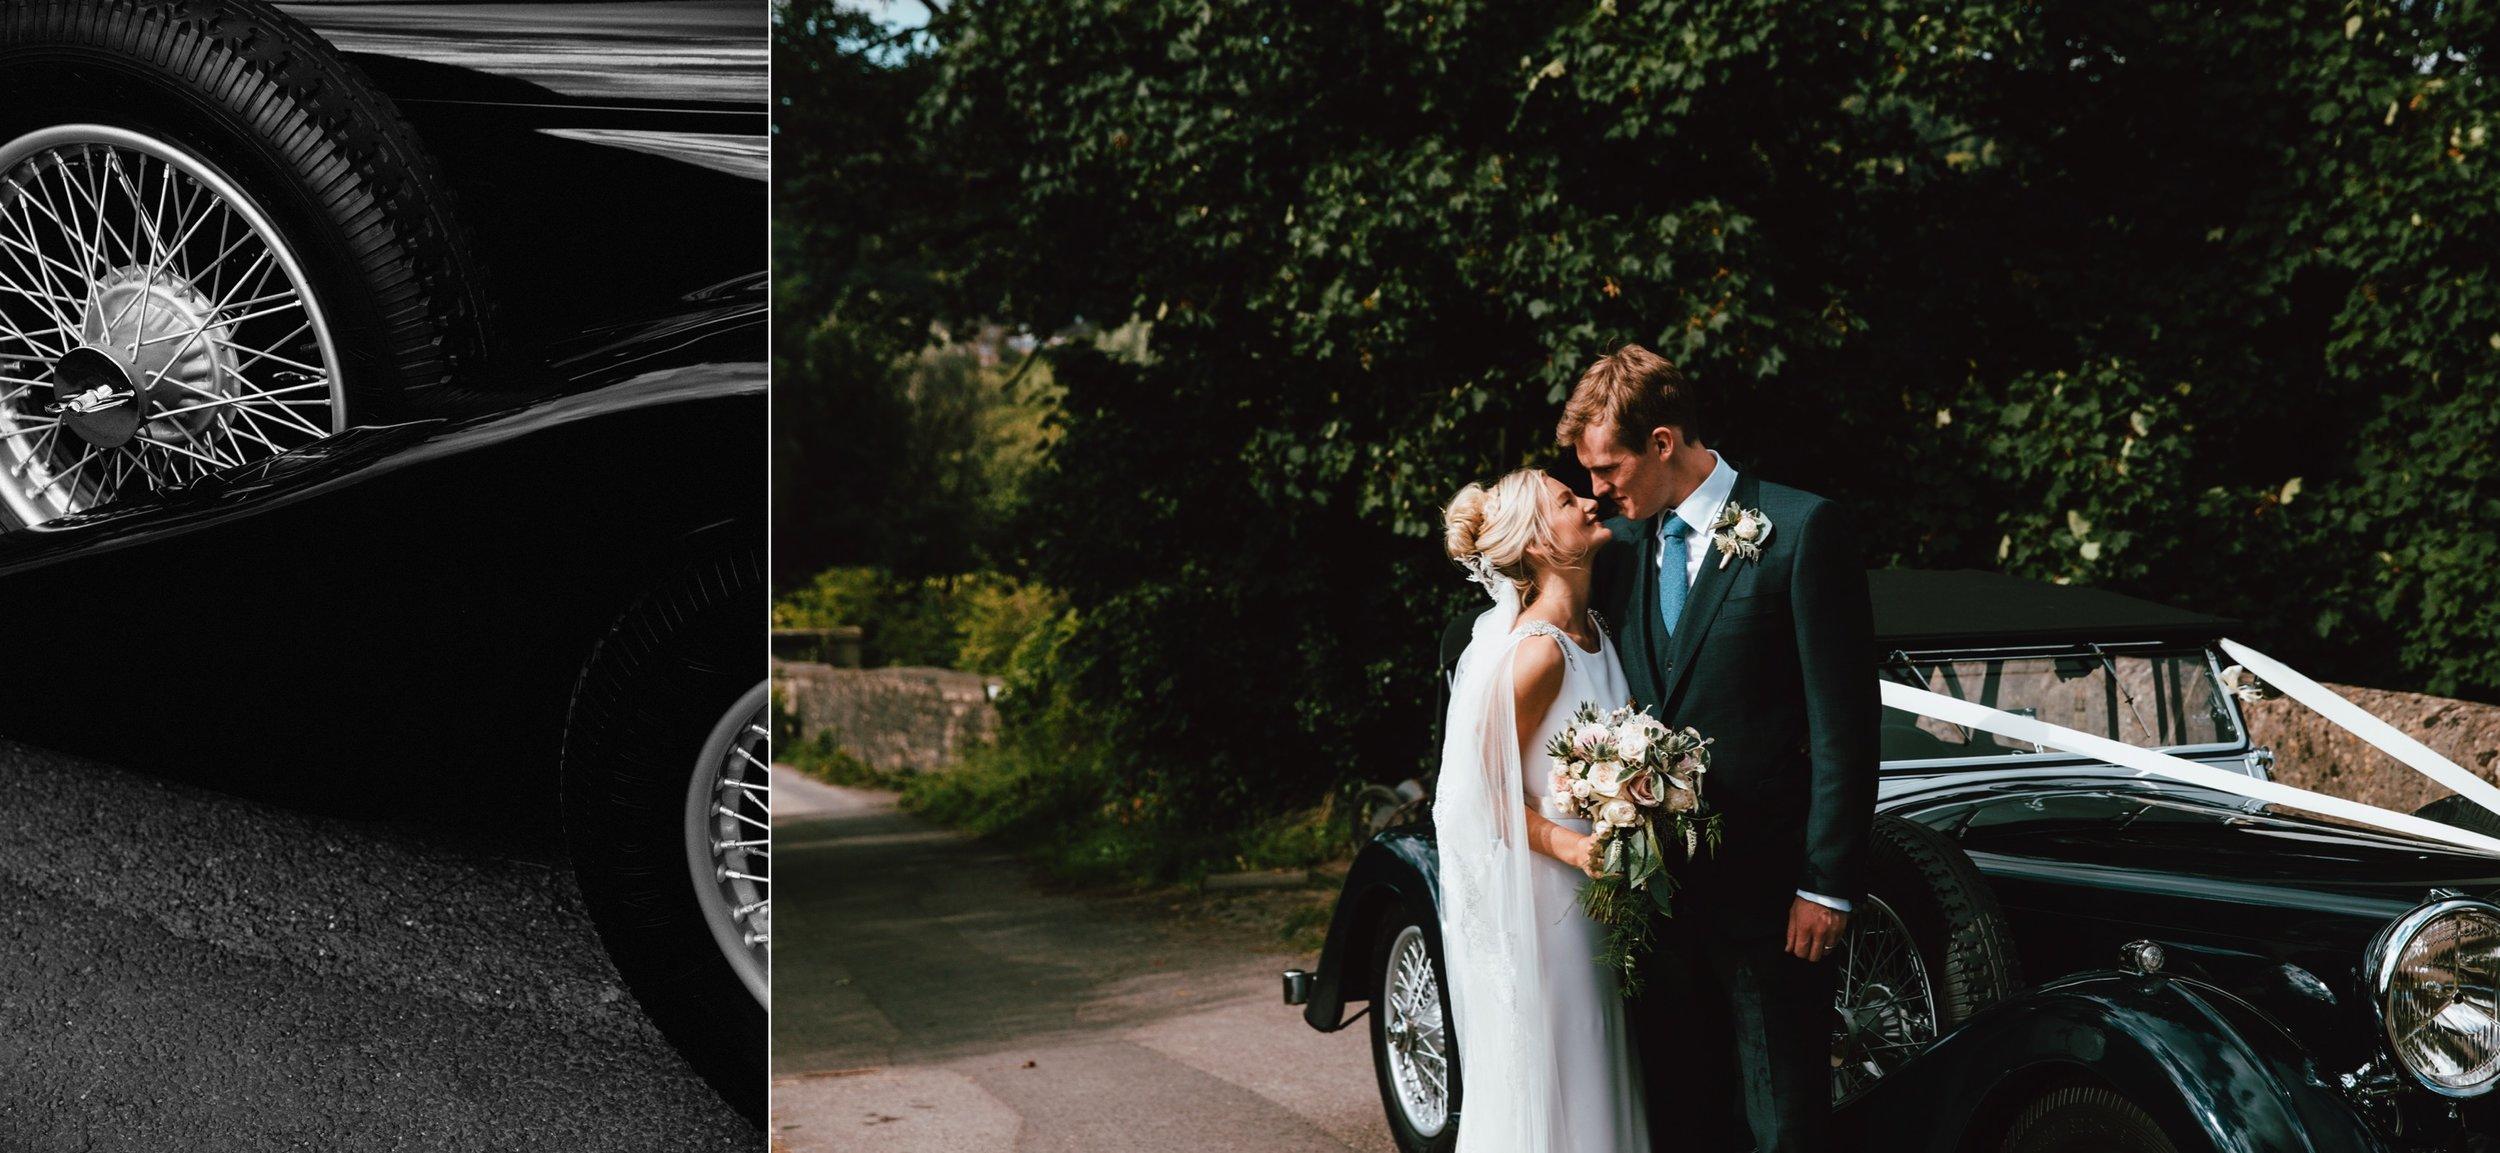 James & Hannah | Oak & Blossom0050.jpg